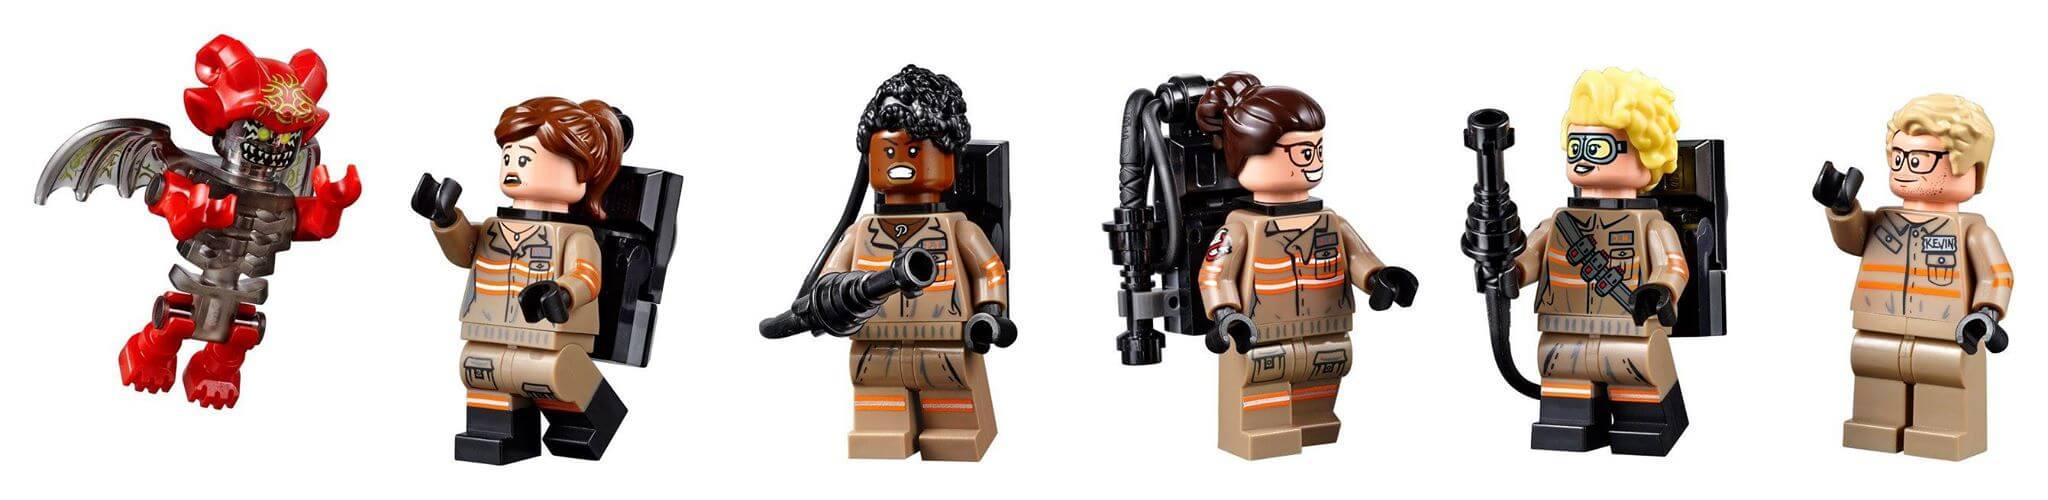 Mua đồ chơi LEGO 75828 - LEGO The Ghostbusters 75828 - Siêu Xe Ecto-1 & 2 của biệt đội Ghostbusters (LEGO Ghostbusters Ecto-1 & 2 75828)